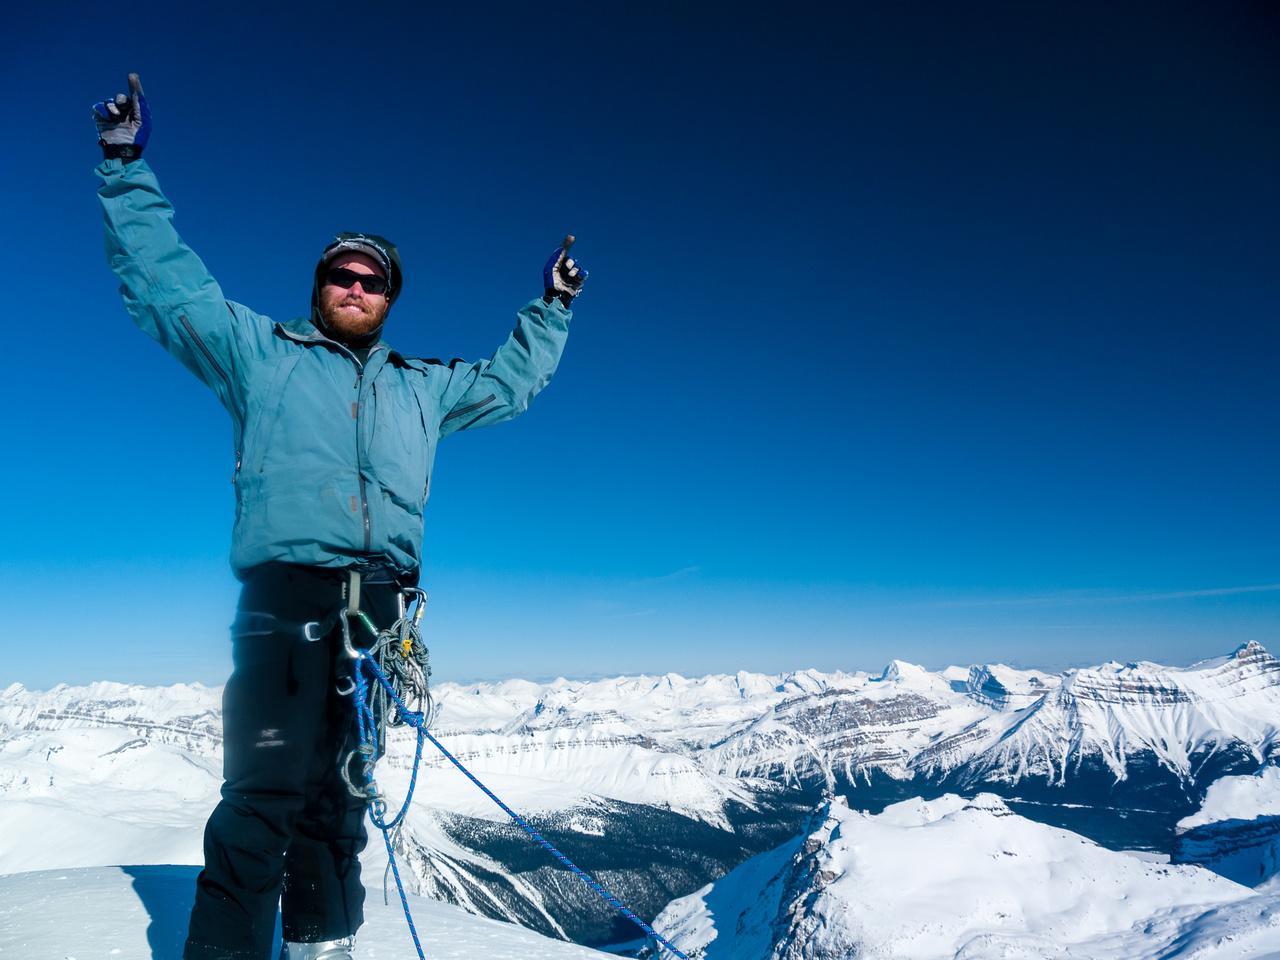 Ben on the summit of Mount Balfour.